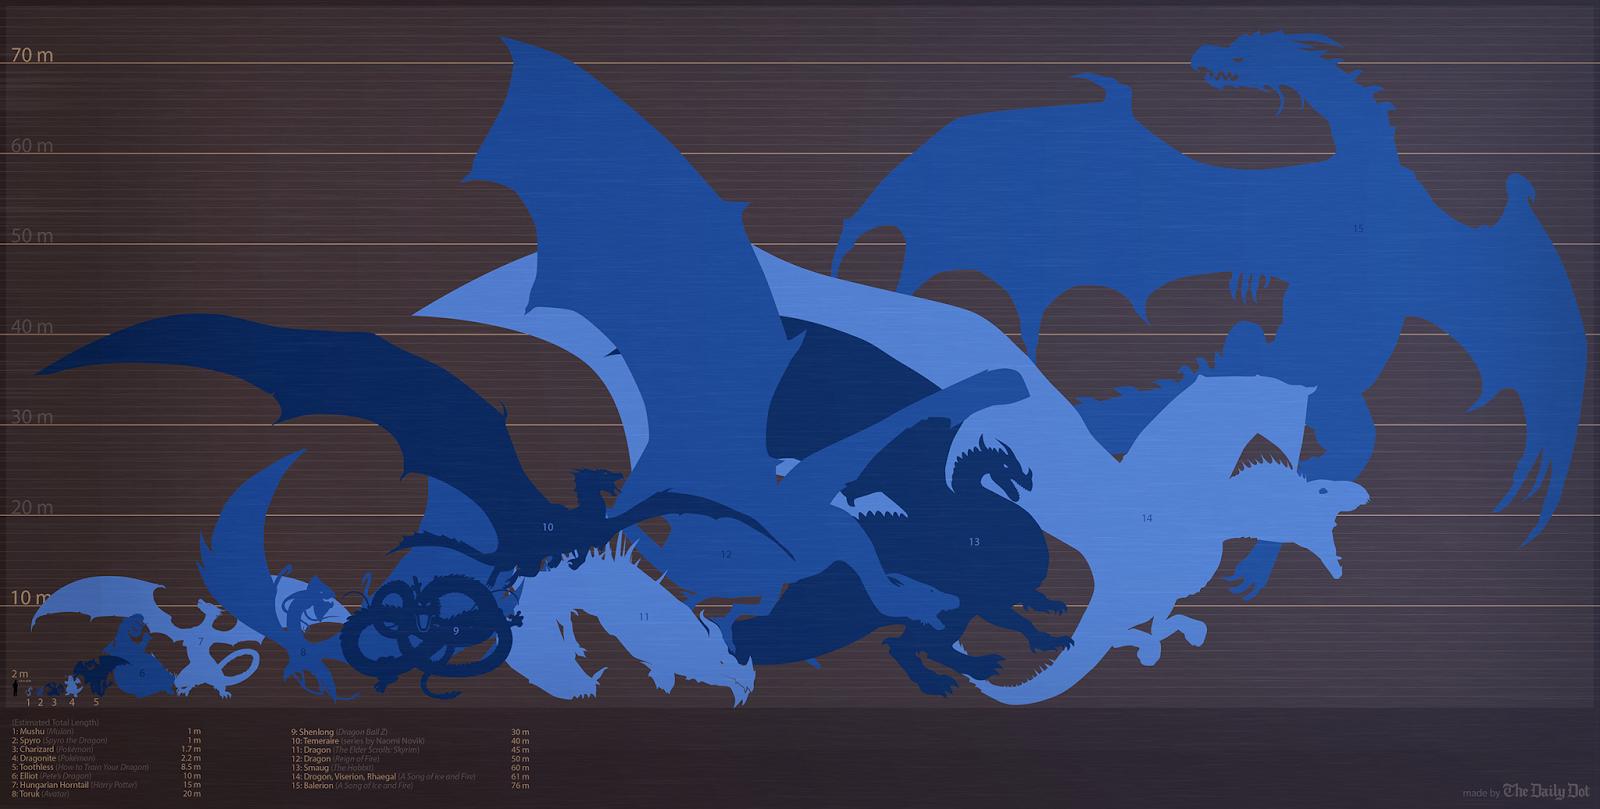 game of thrones dragon, hobbit, smaug, charizard pokemon shen long